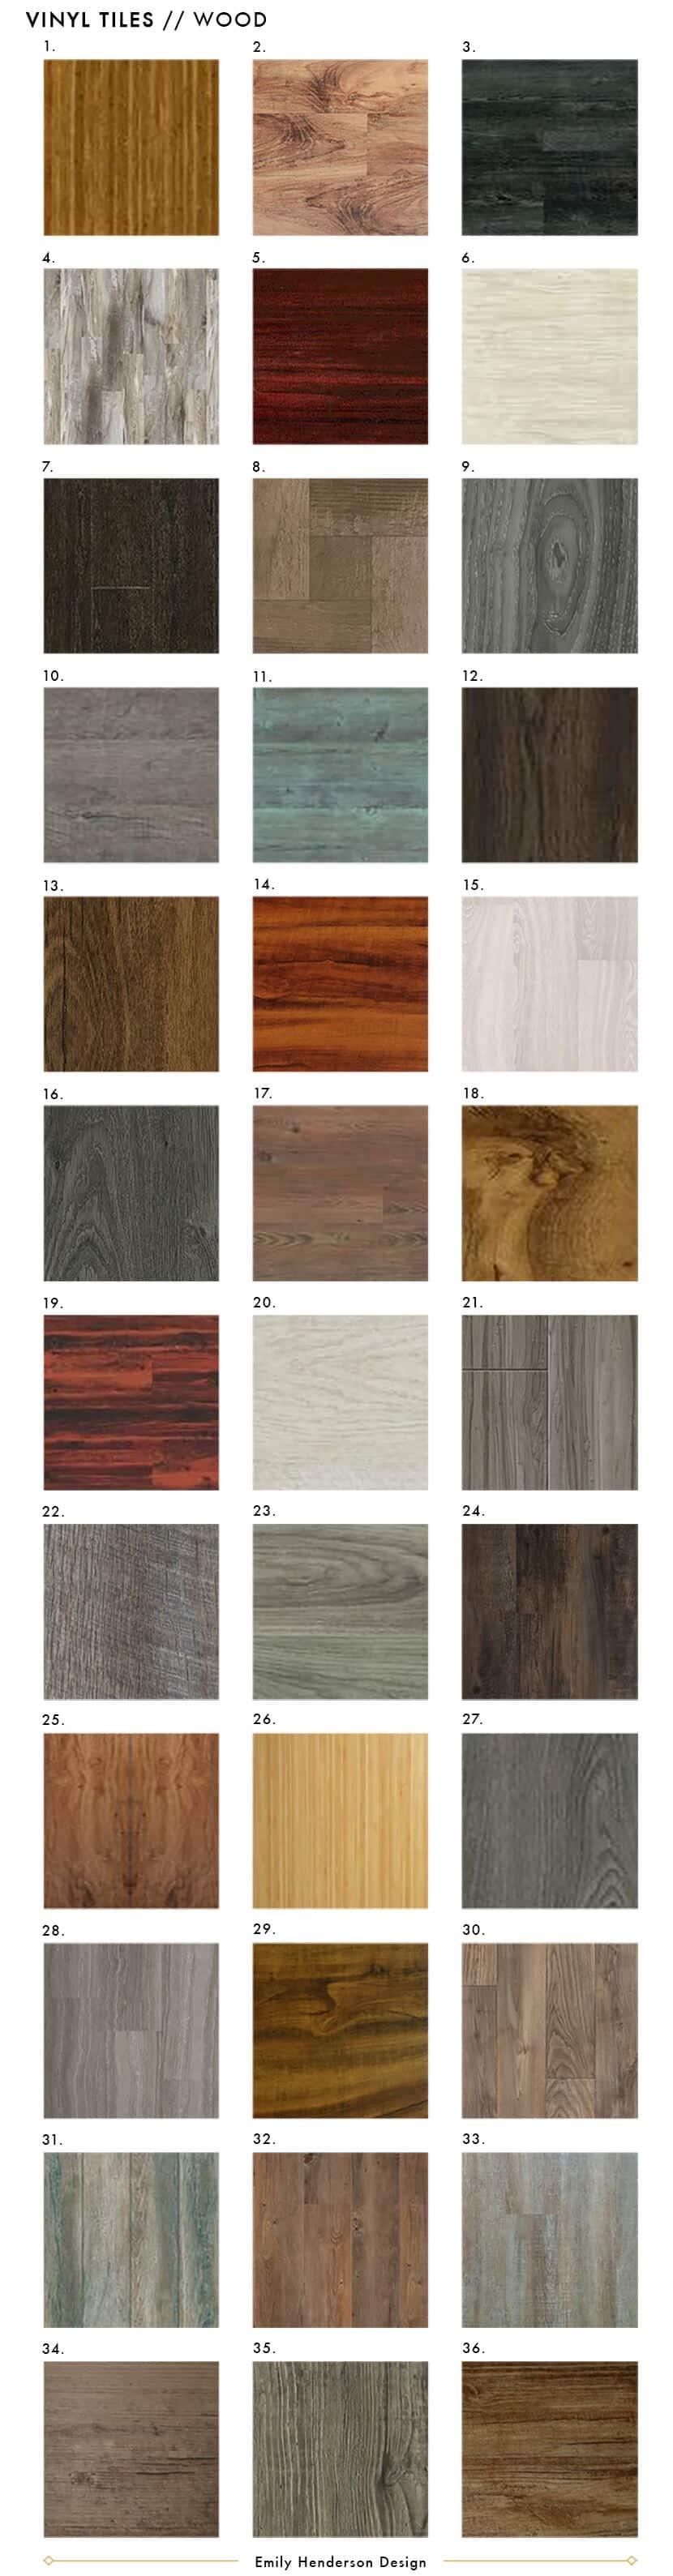 NEW Vinyl Tile Wood